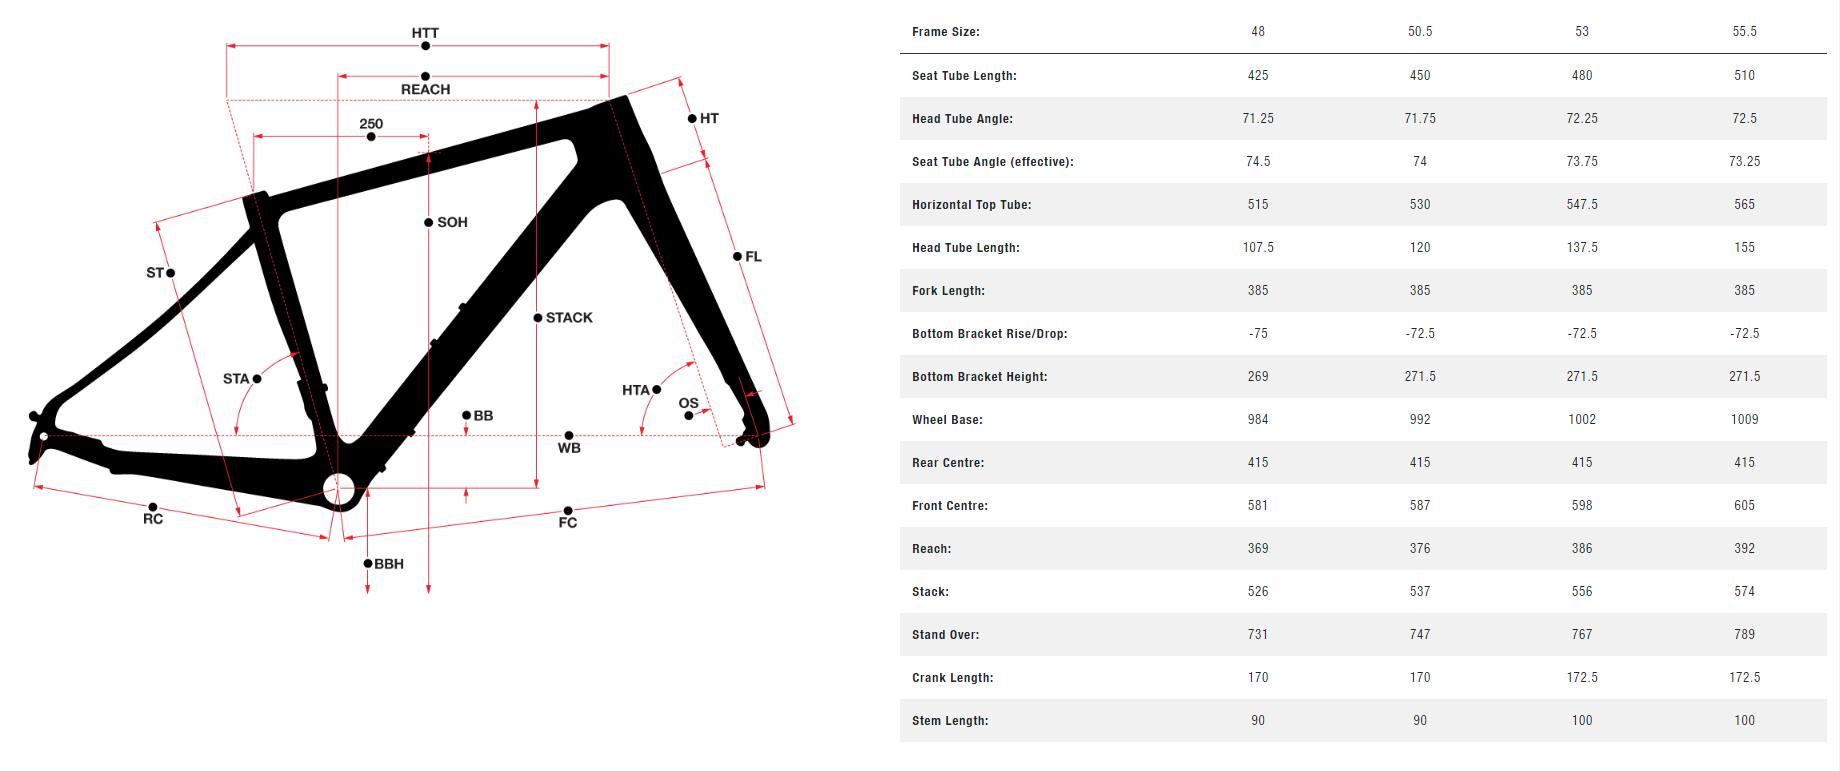 Norco Section C Women's geometry chart